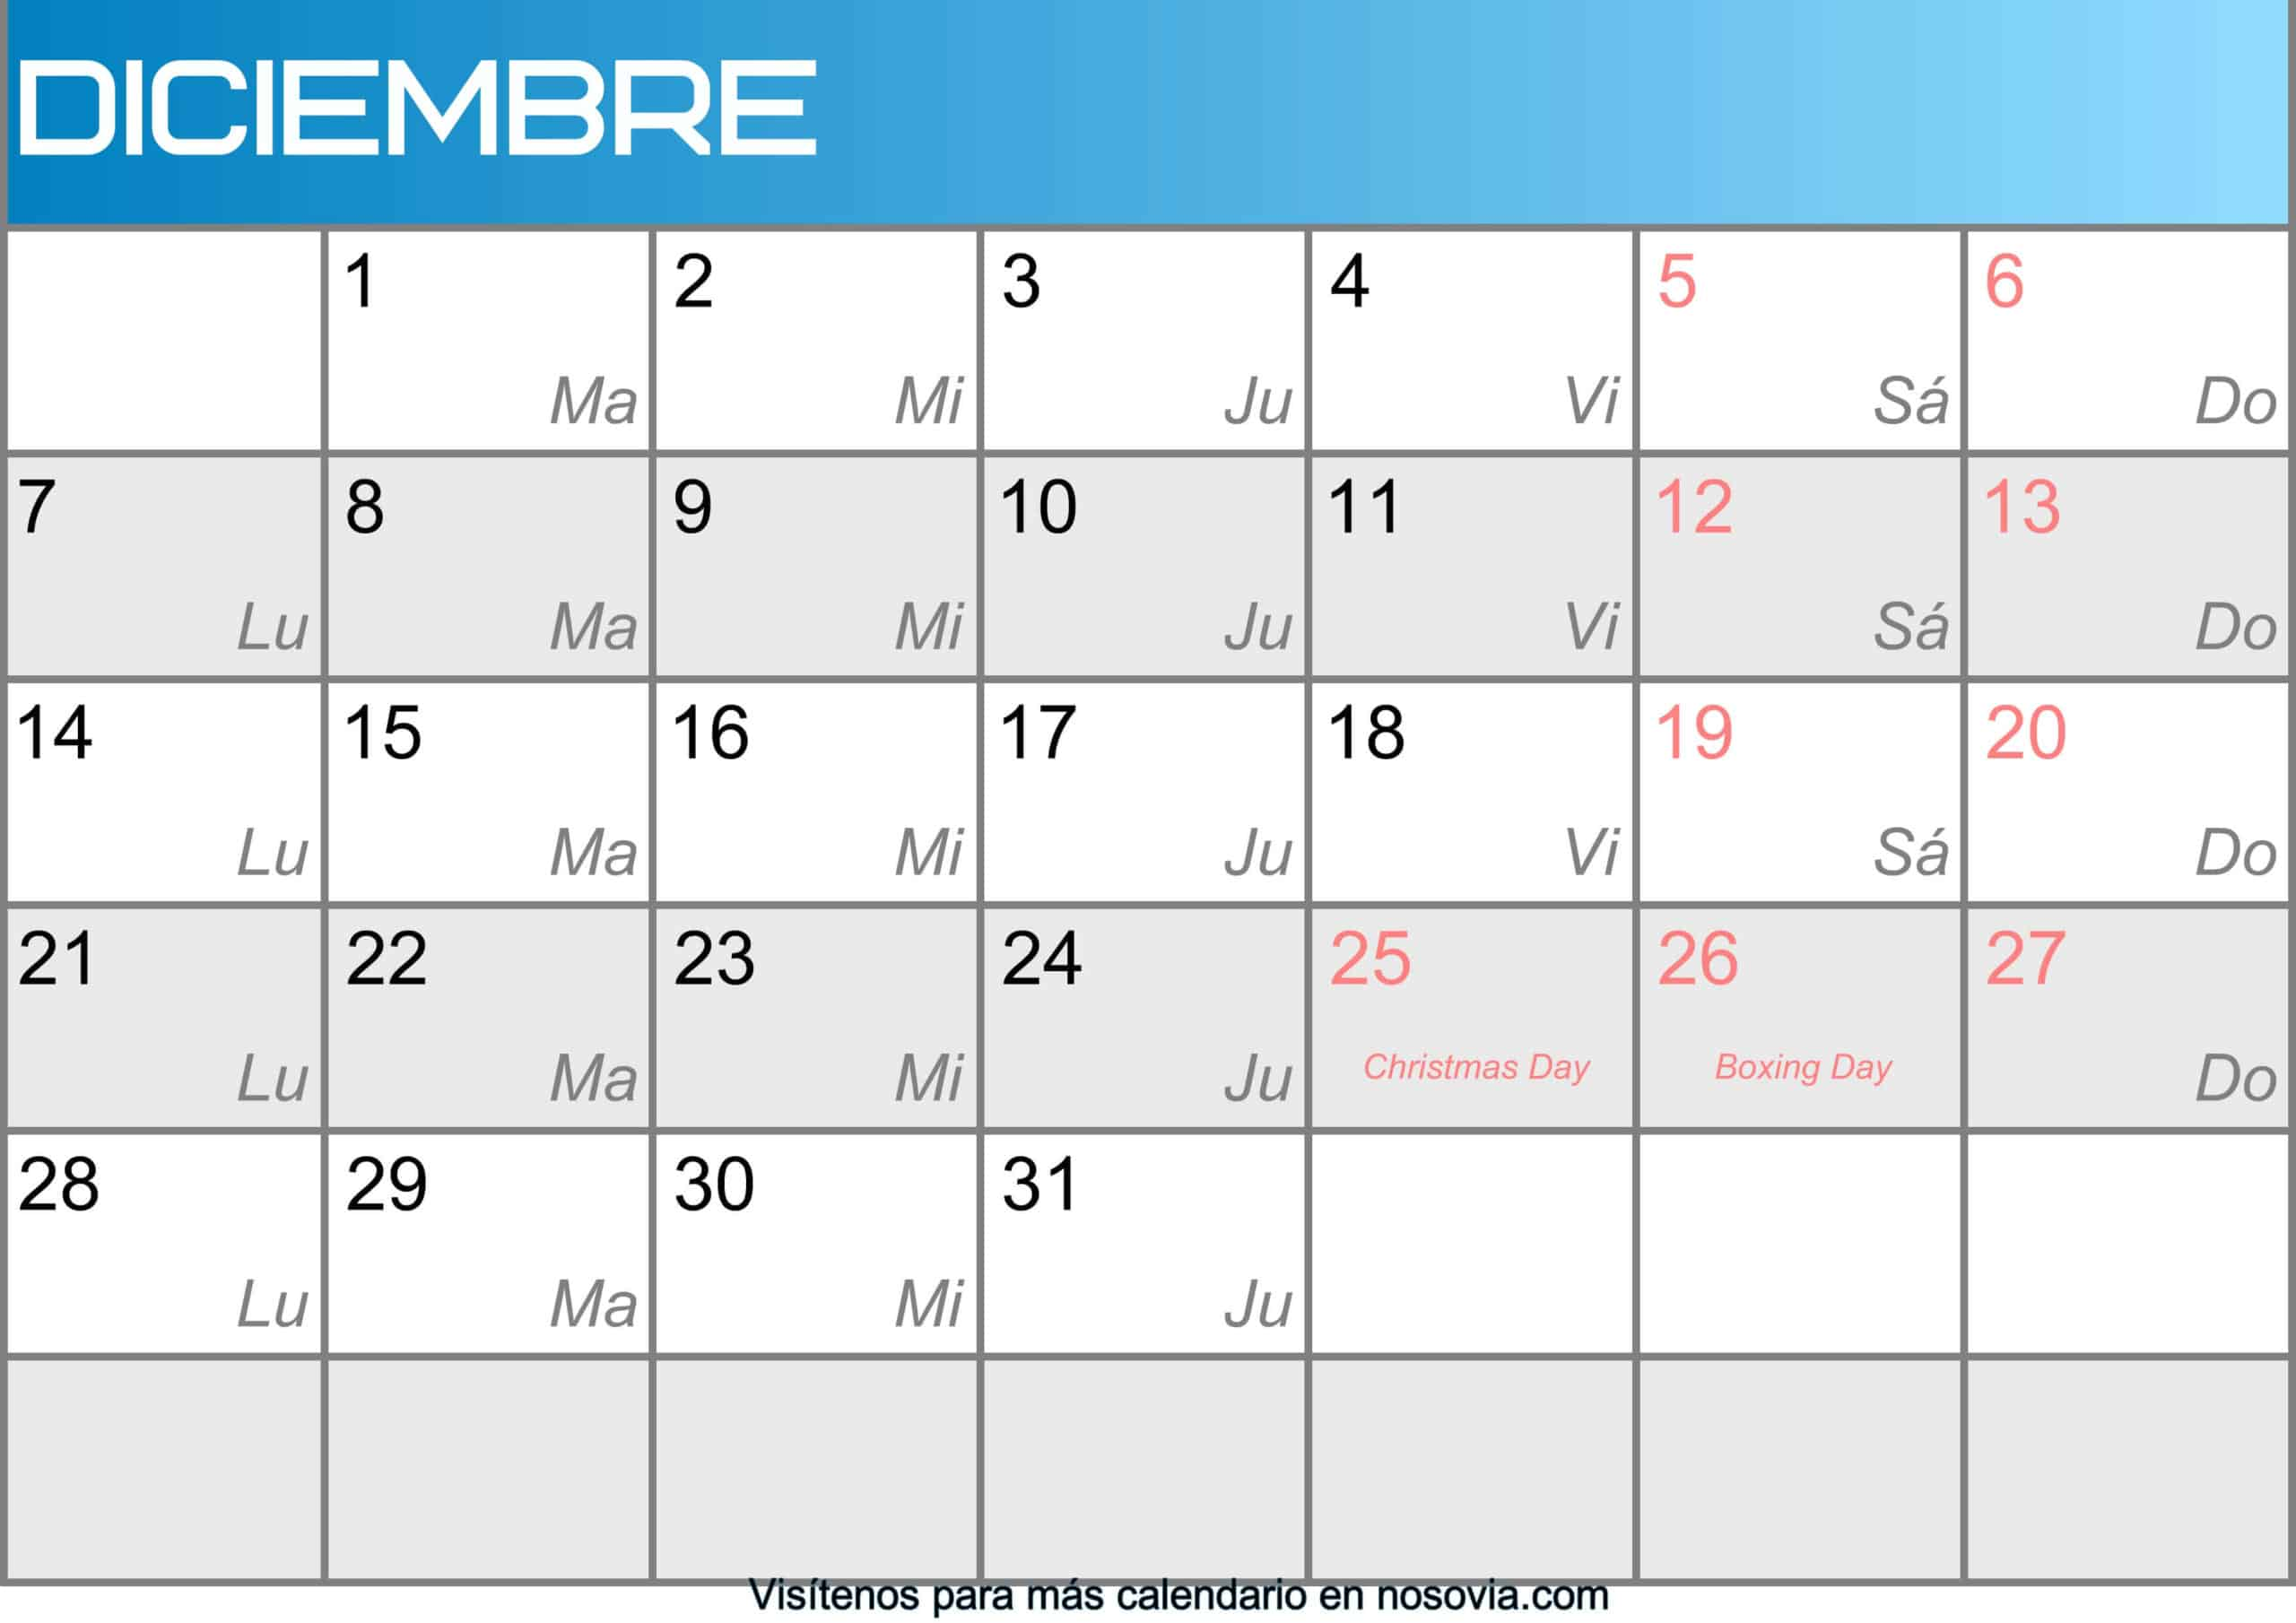 Calendario-diciembre-2020-Con-Festivos-Imágenes